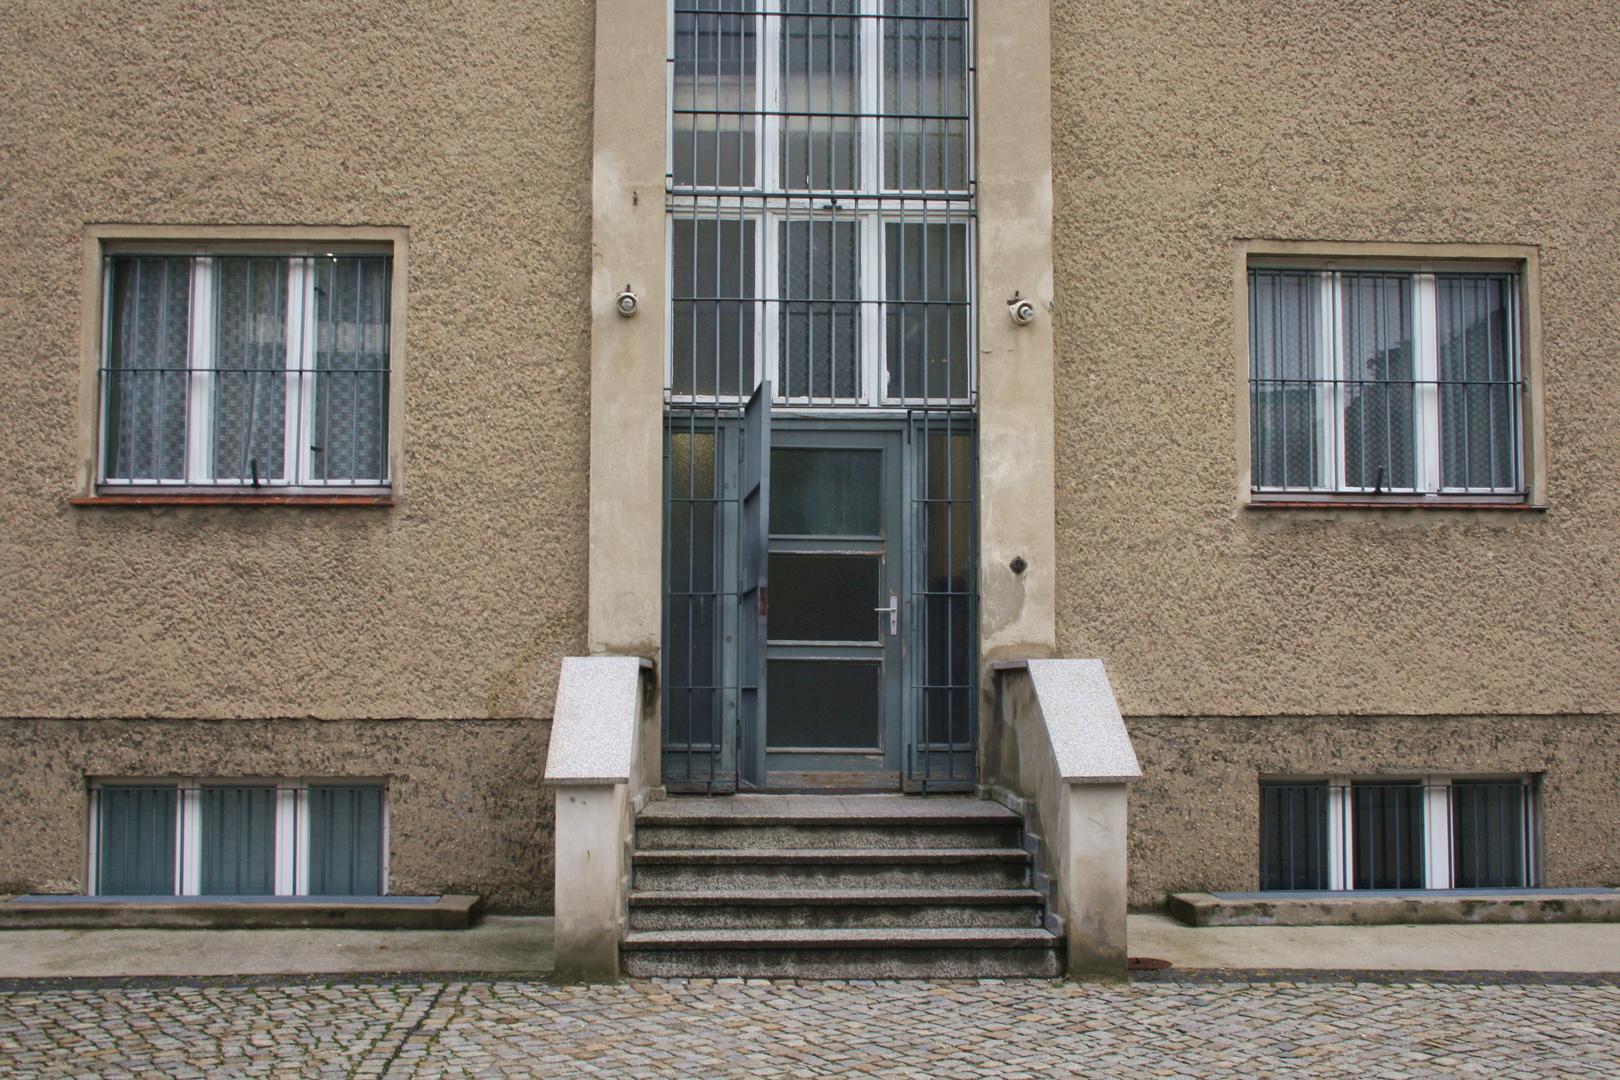 DDR-Ästhetik